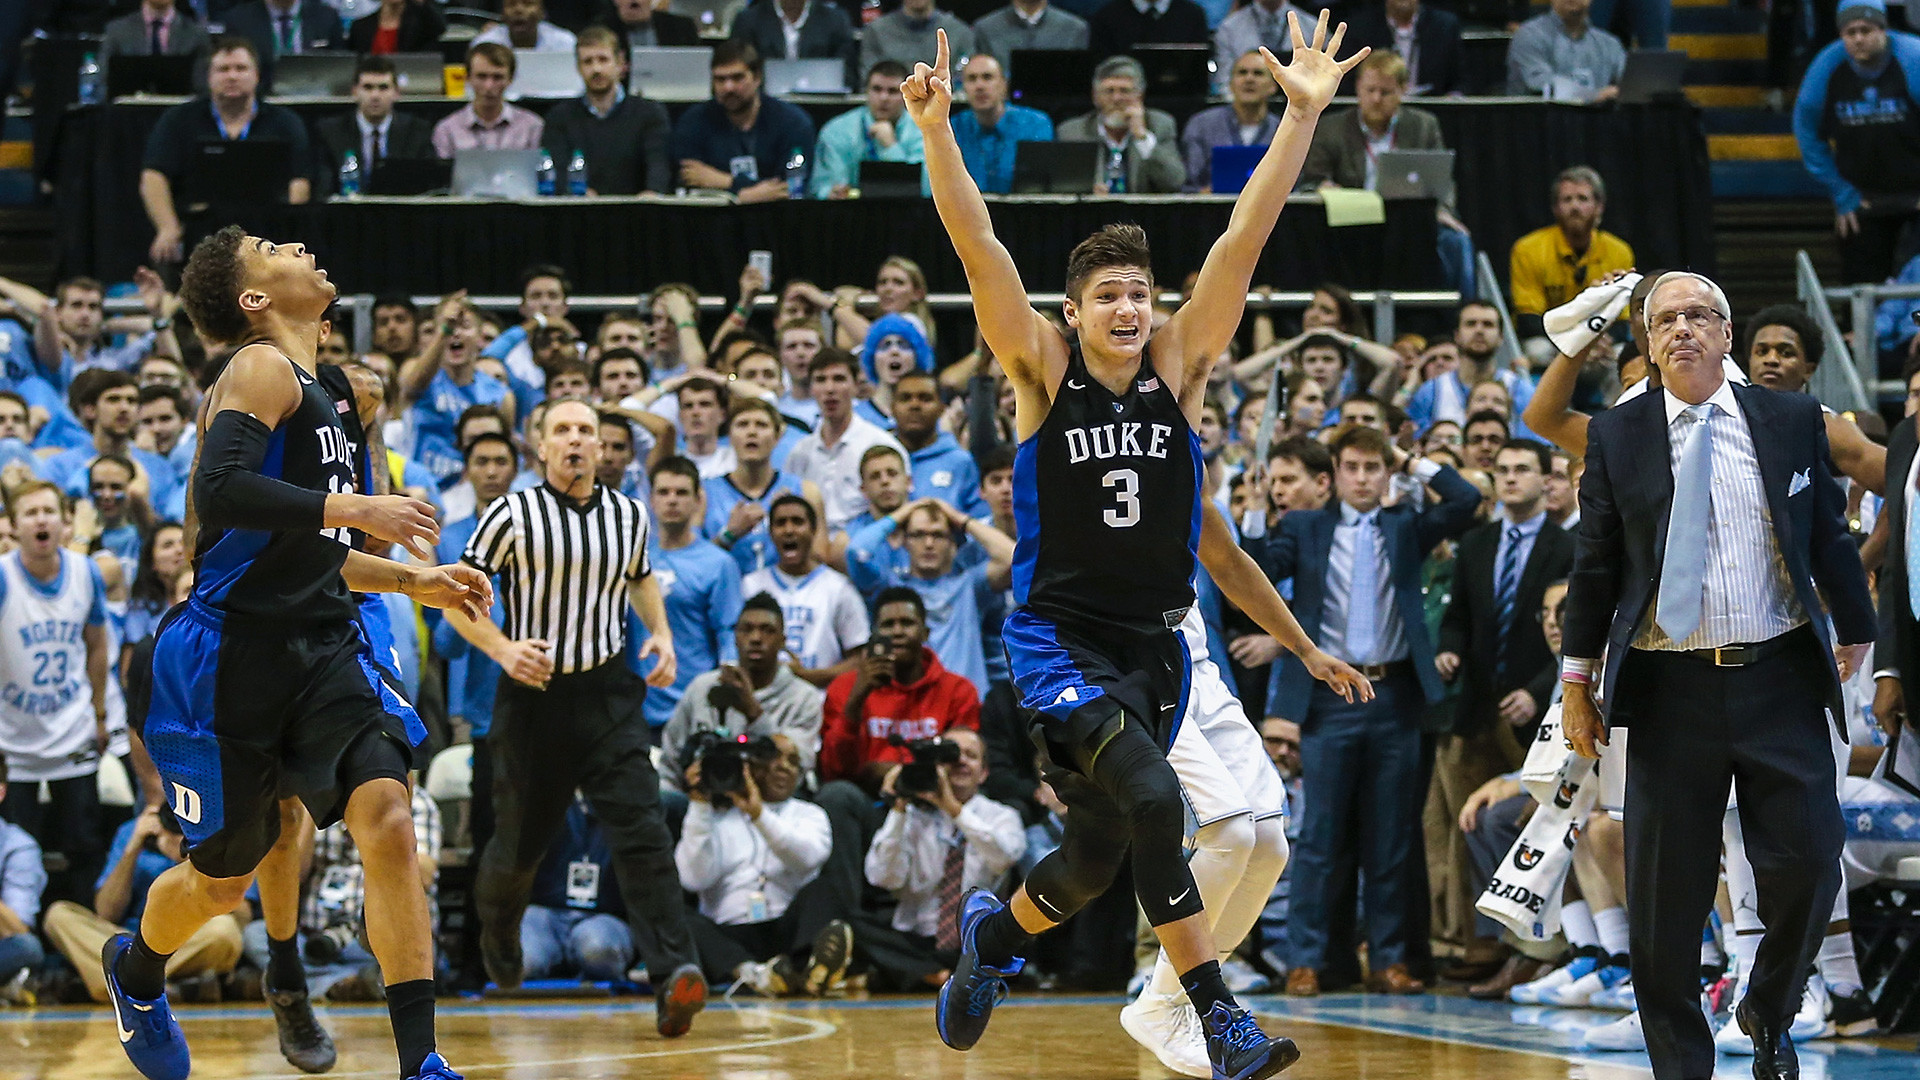 Duke vs North Carolina photos : Incredible photos from Duke-North Carolina  | COLLEGE BASKETBALL | Pinterest | Duke vs and College basketball